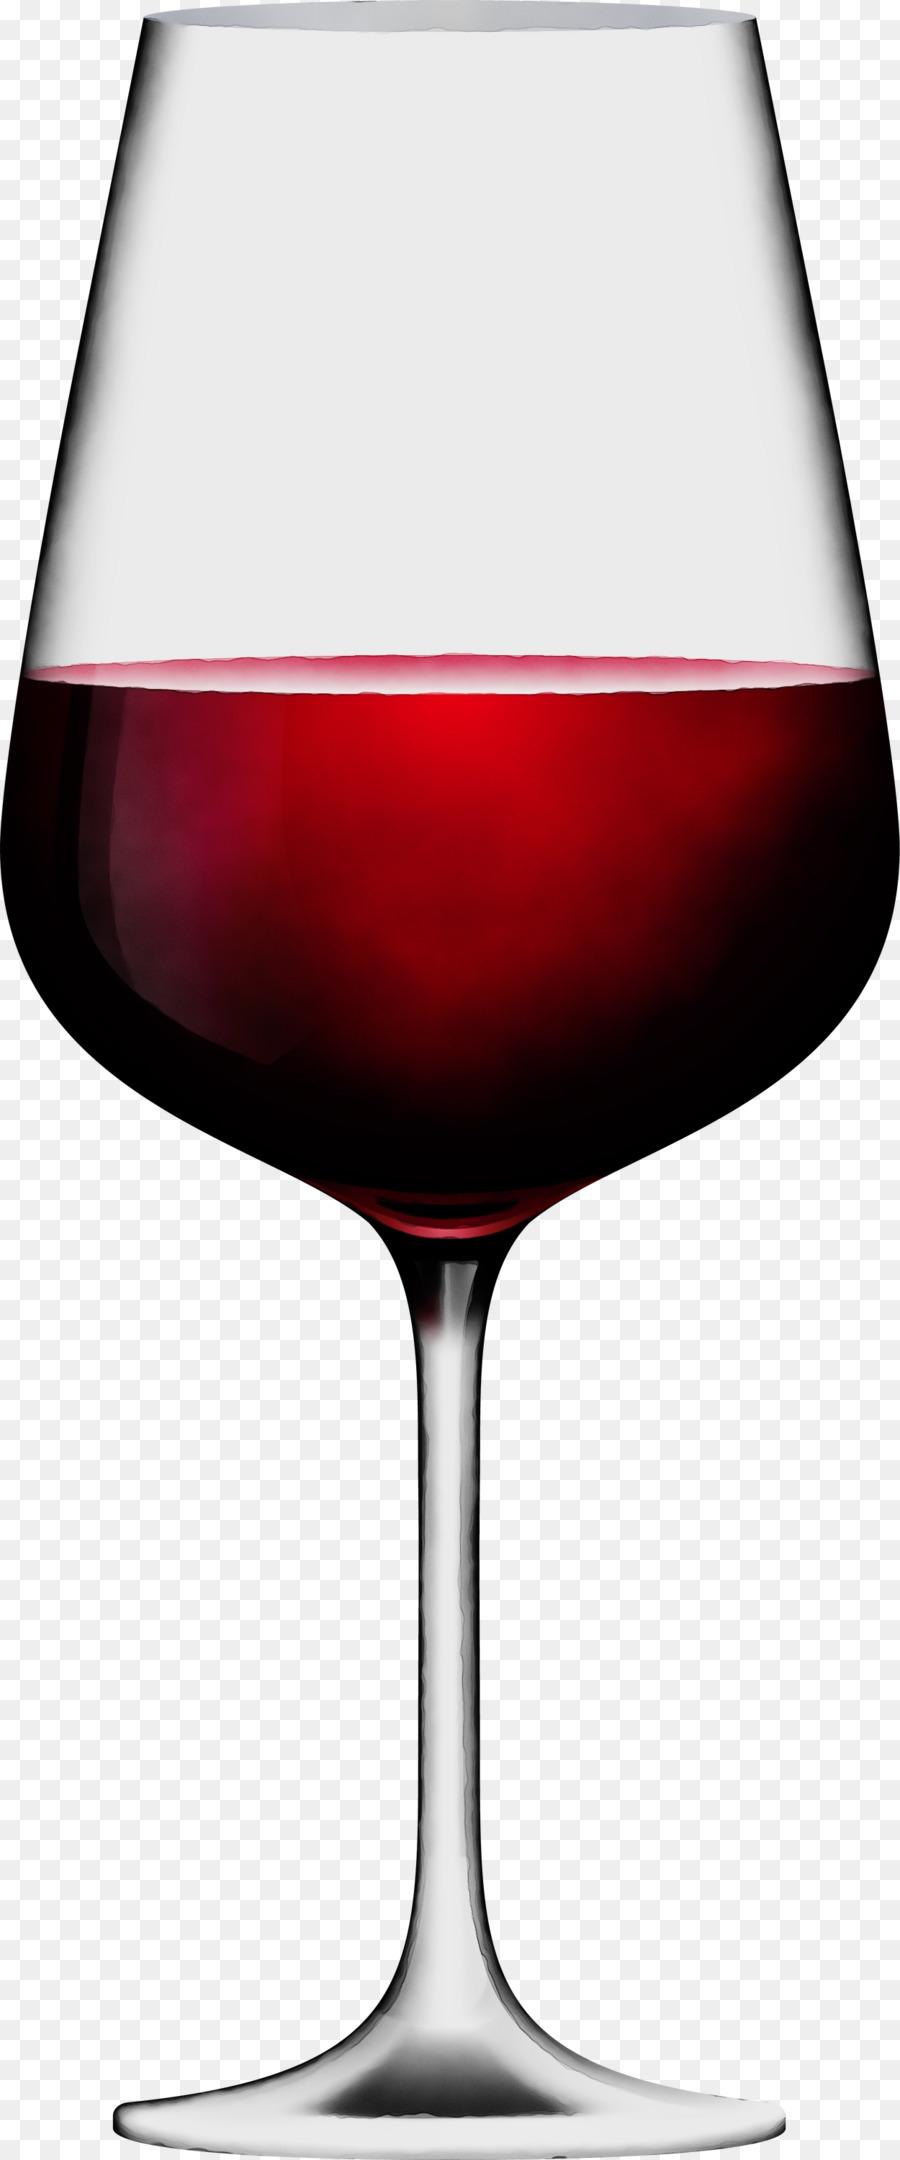 Descarga gratuita de Vino, Vino Tinto, Copa De Vino Imágen de Png